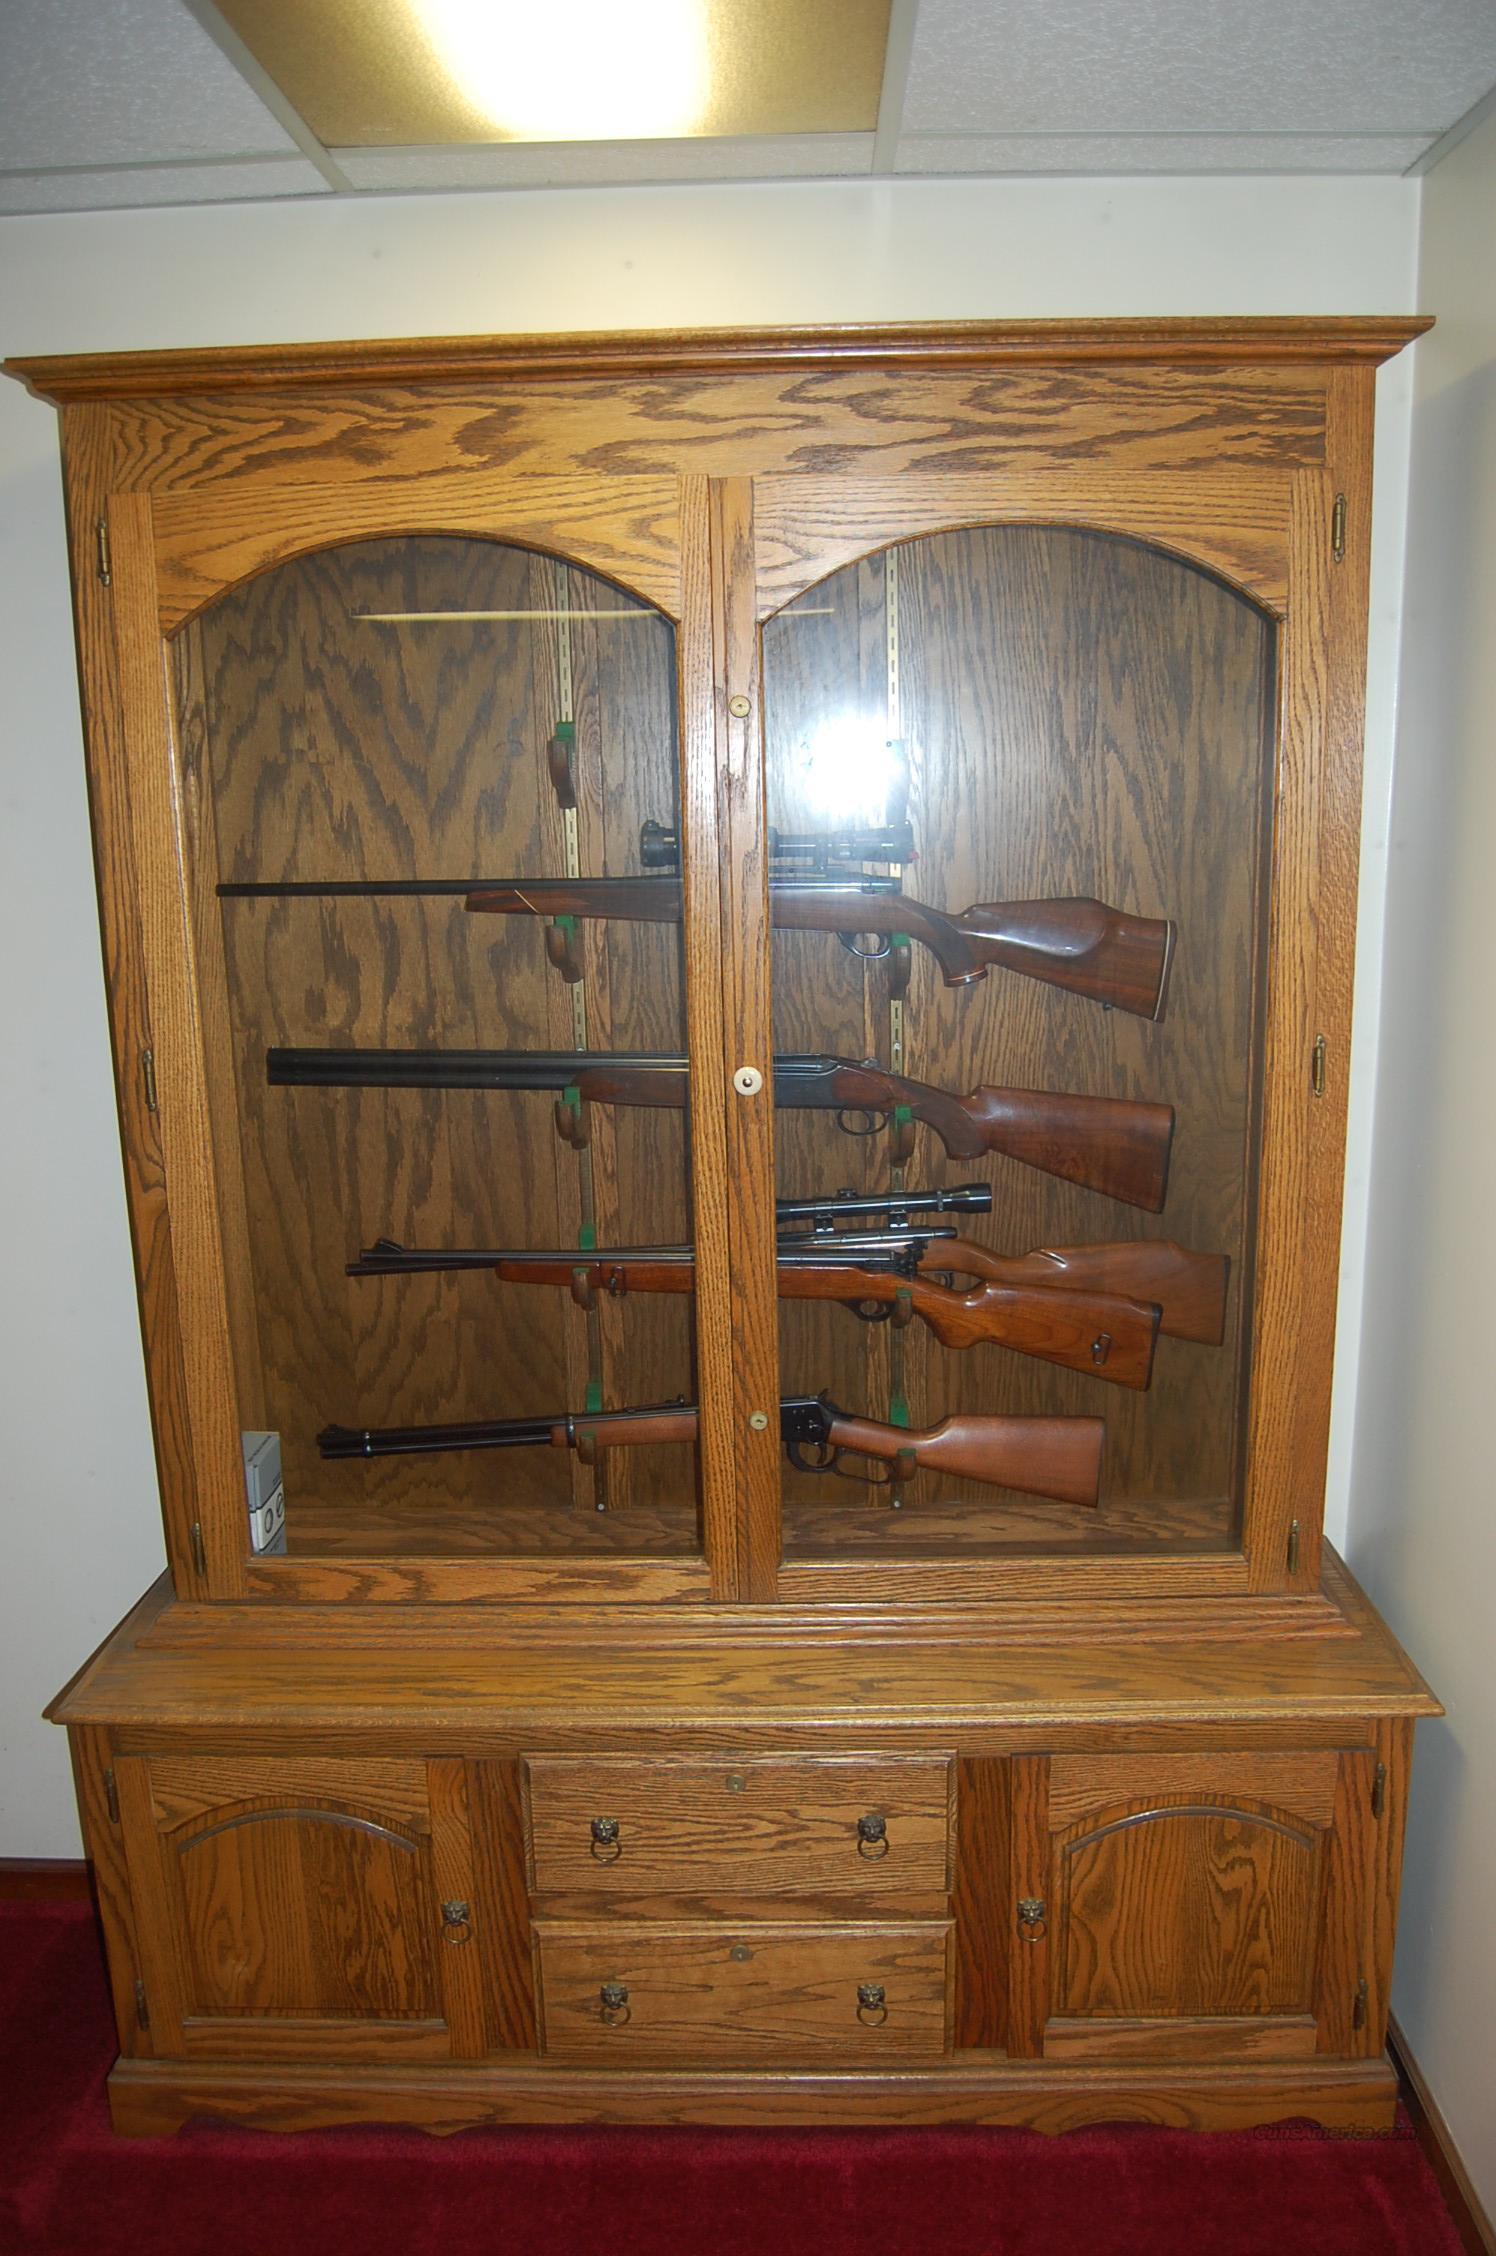 Sales Near Me >> Gun Cabinet,Solid Oak, Holds 10 Guns in Beautif... for sale